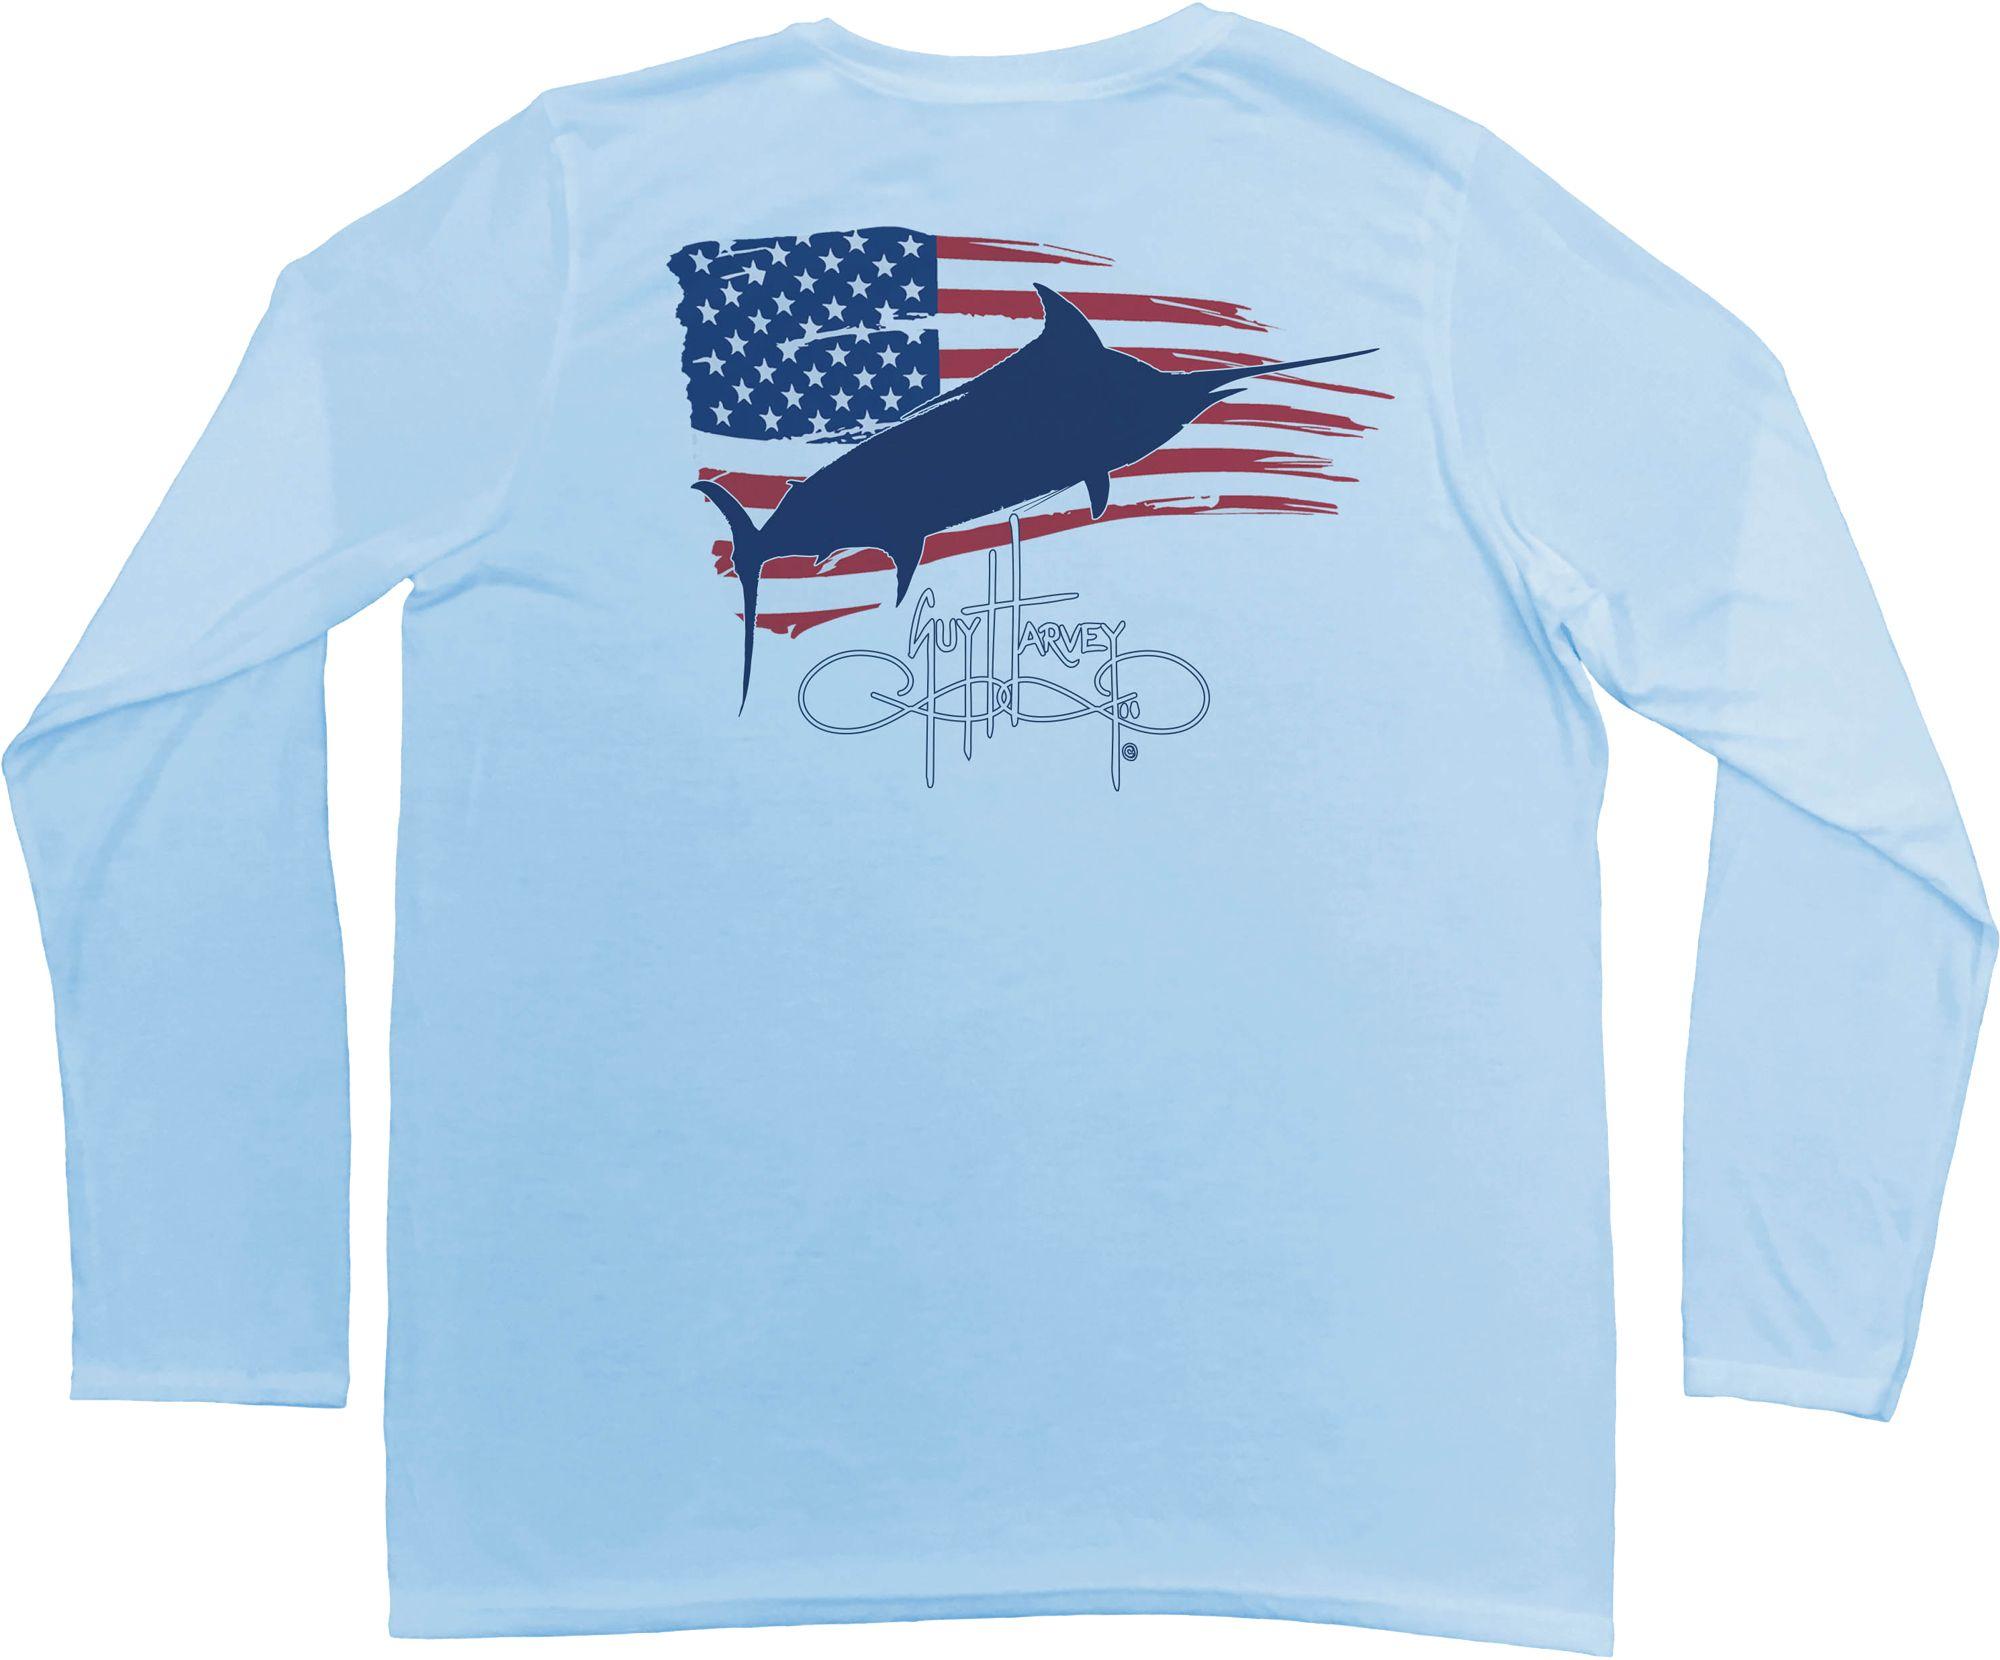 2670ff4b89df2 Guy Harvey Long Sleeve Tee Shirts